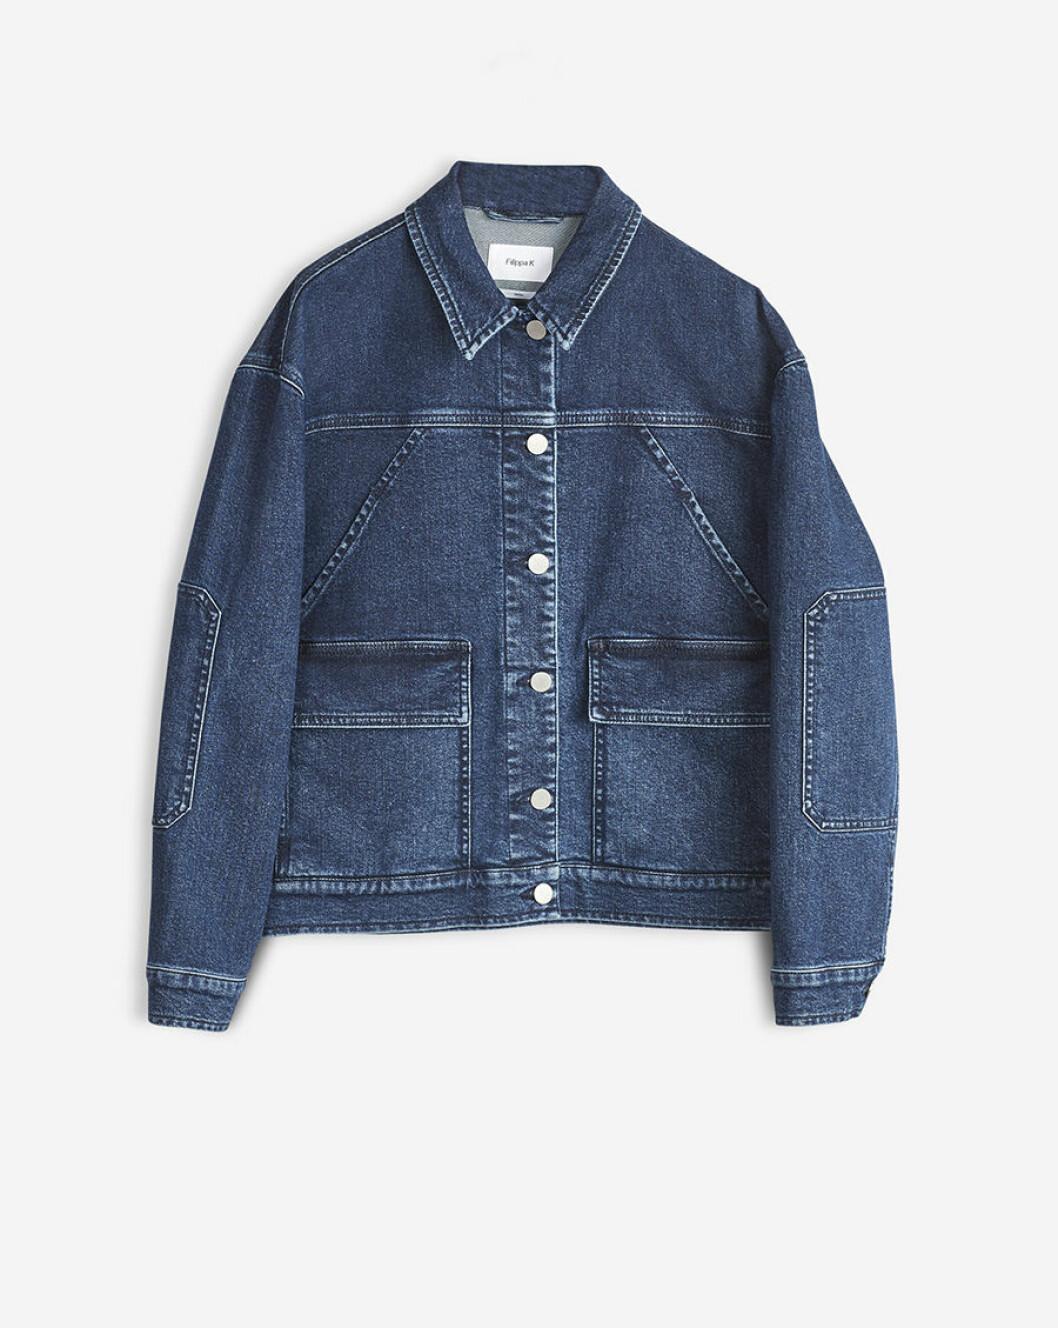 filippa-k_oversized-denim-jacket-1_jackets_art-no-23847_2200-sek_2200-nok_2000-dkk_205-gbp_255-eur_material-98-cotton-2-elastane-_size-xs-xl